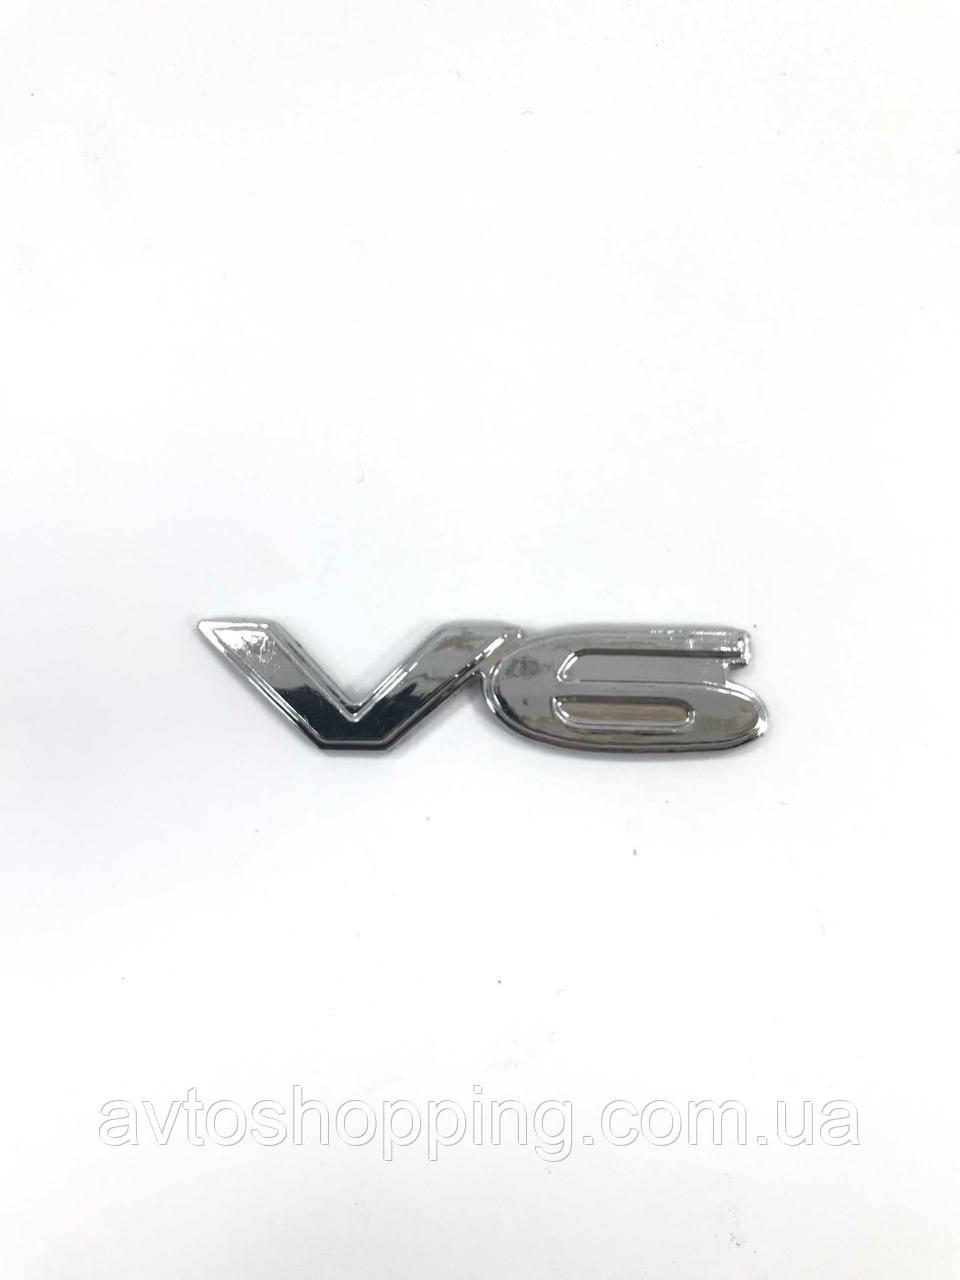 Значок эмблема на багажник надпись Двигатель V6